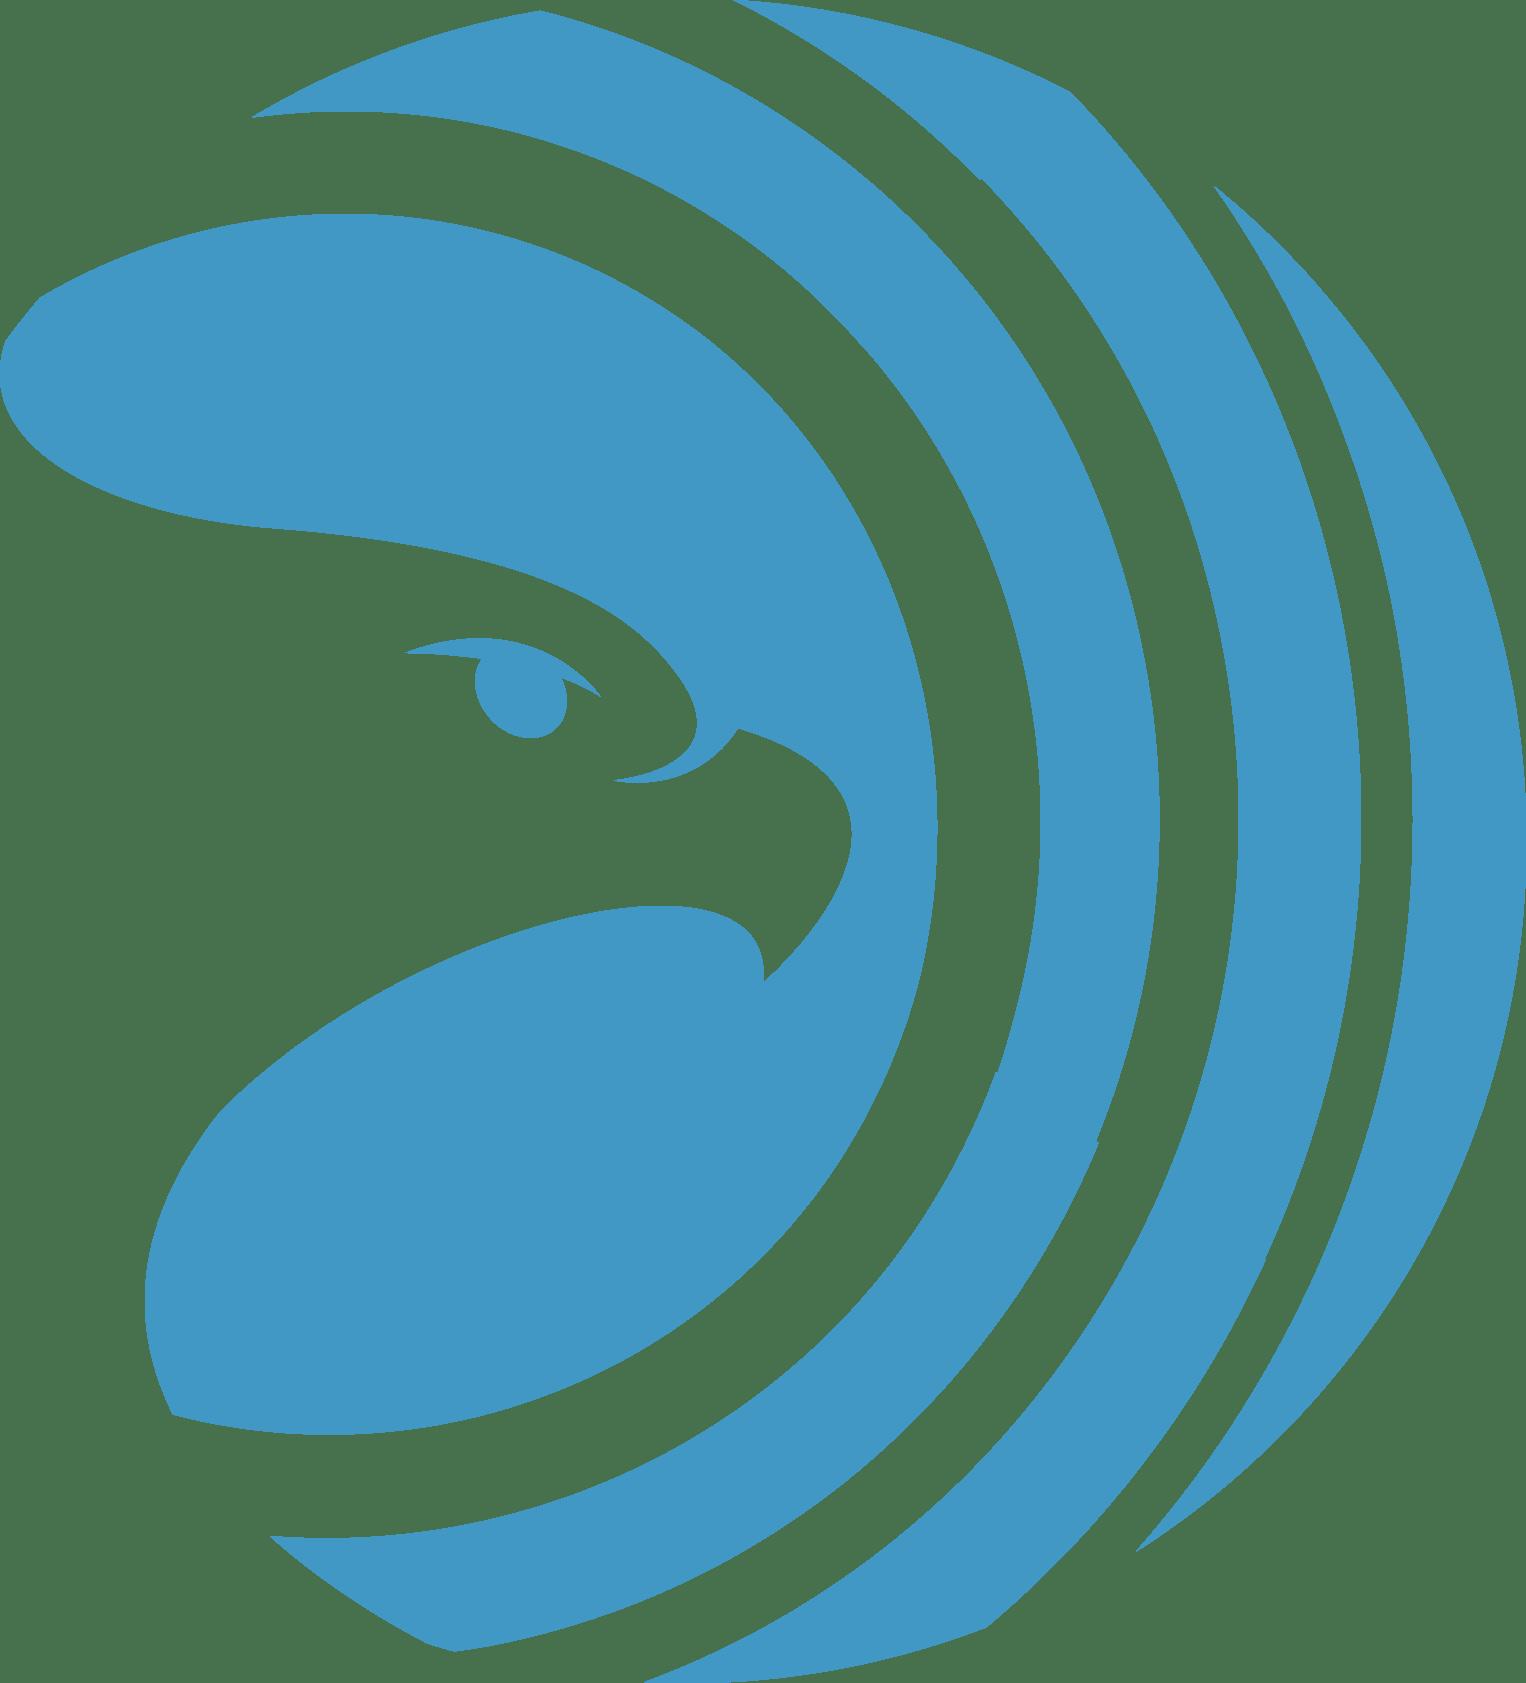 Eagles Talent Speaker Management, For Speakers Seeking Representation